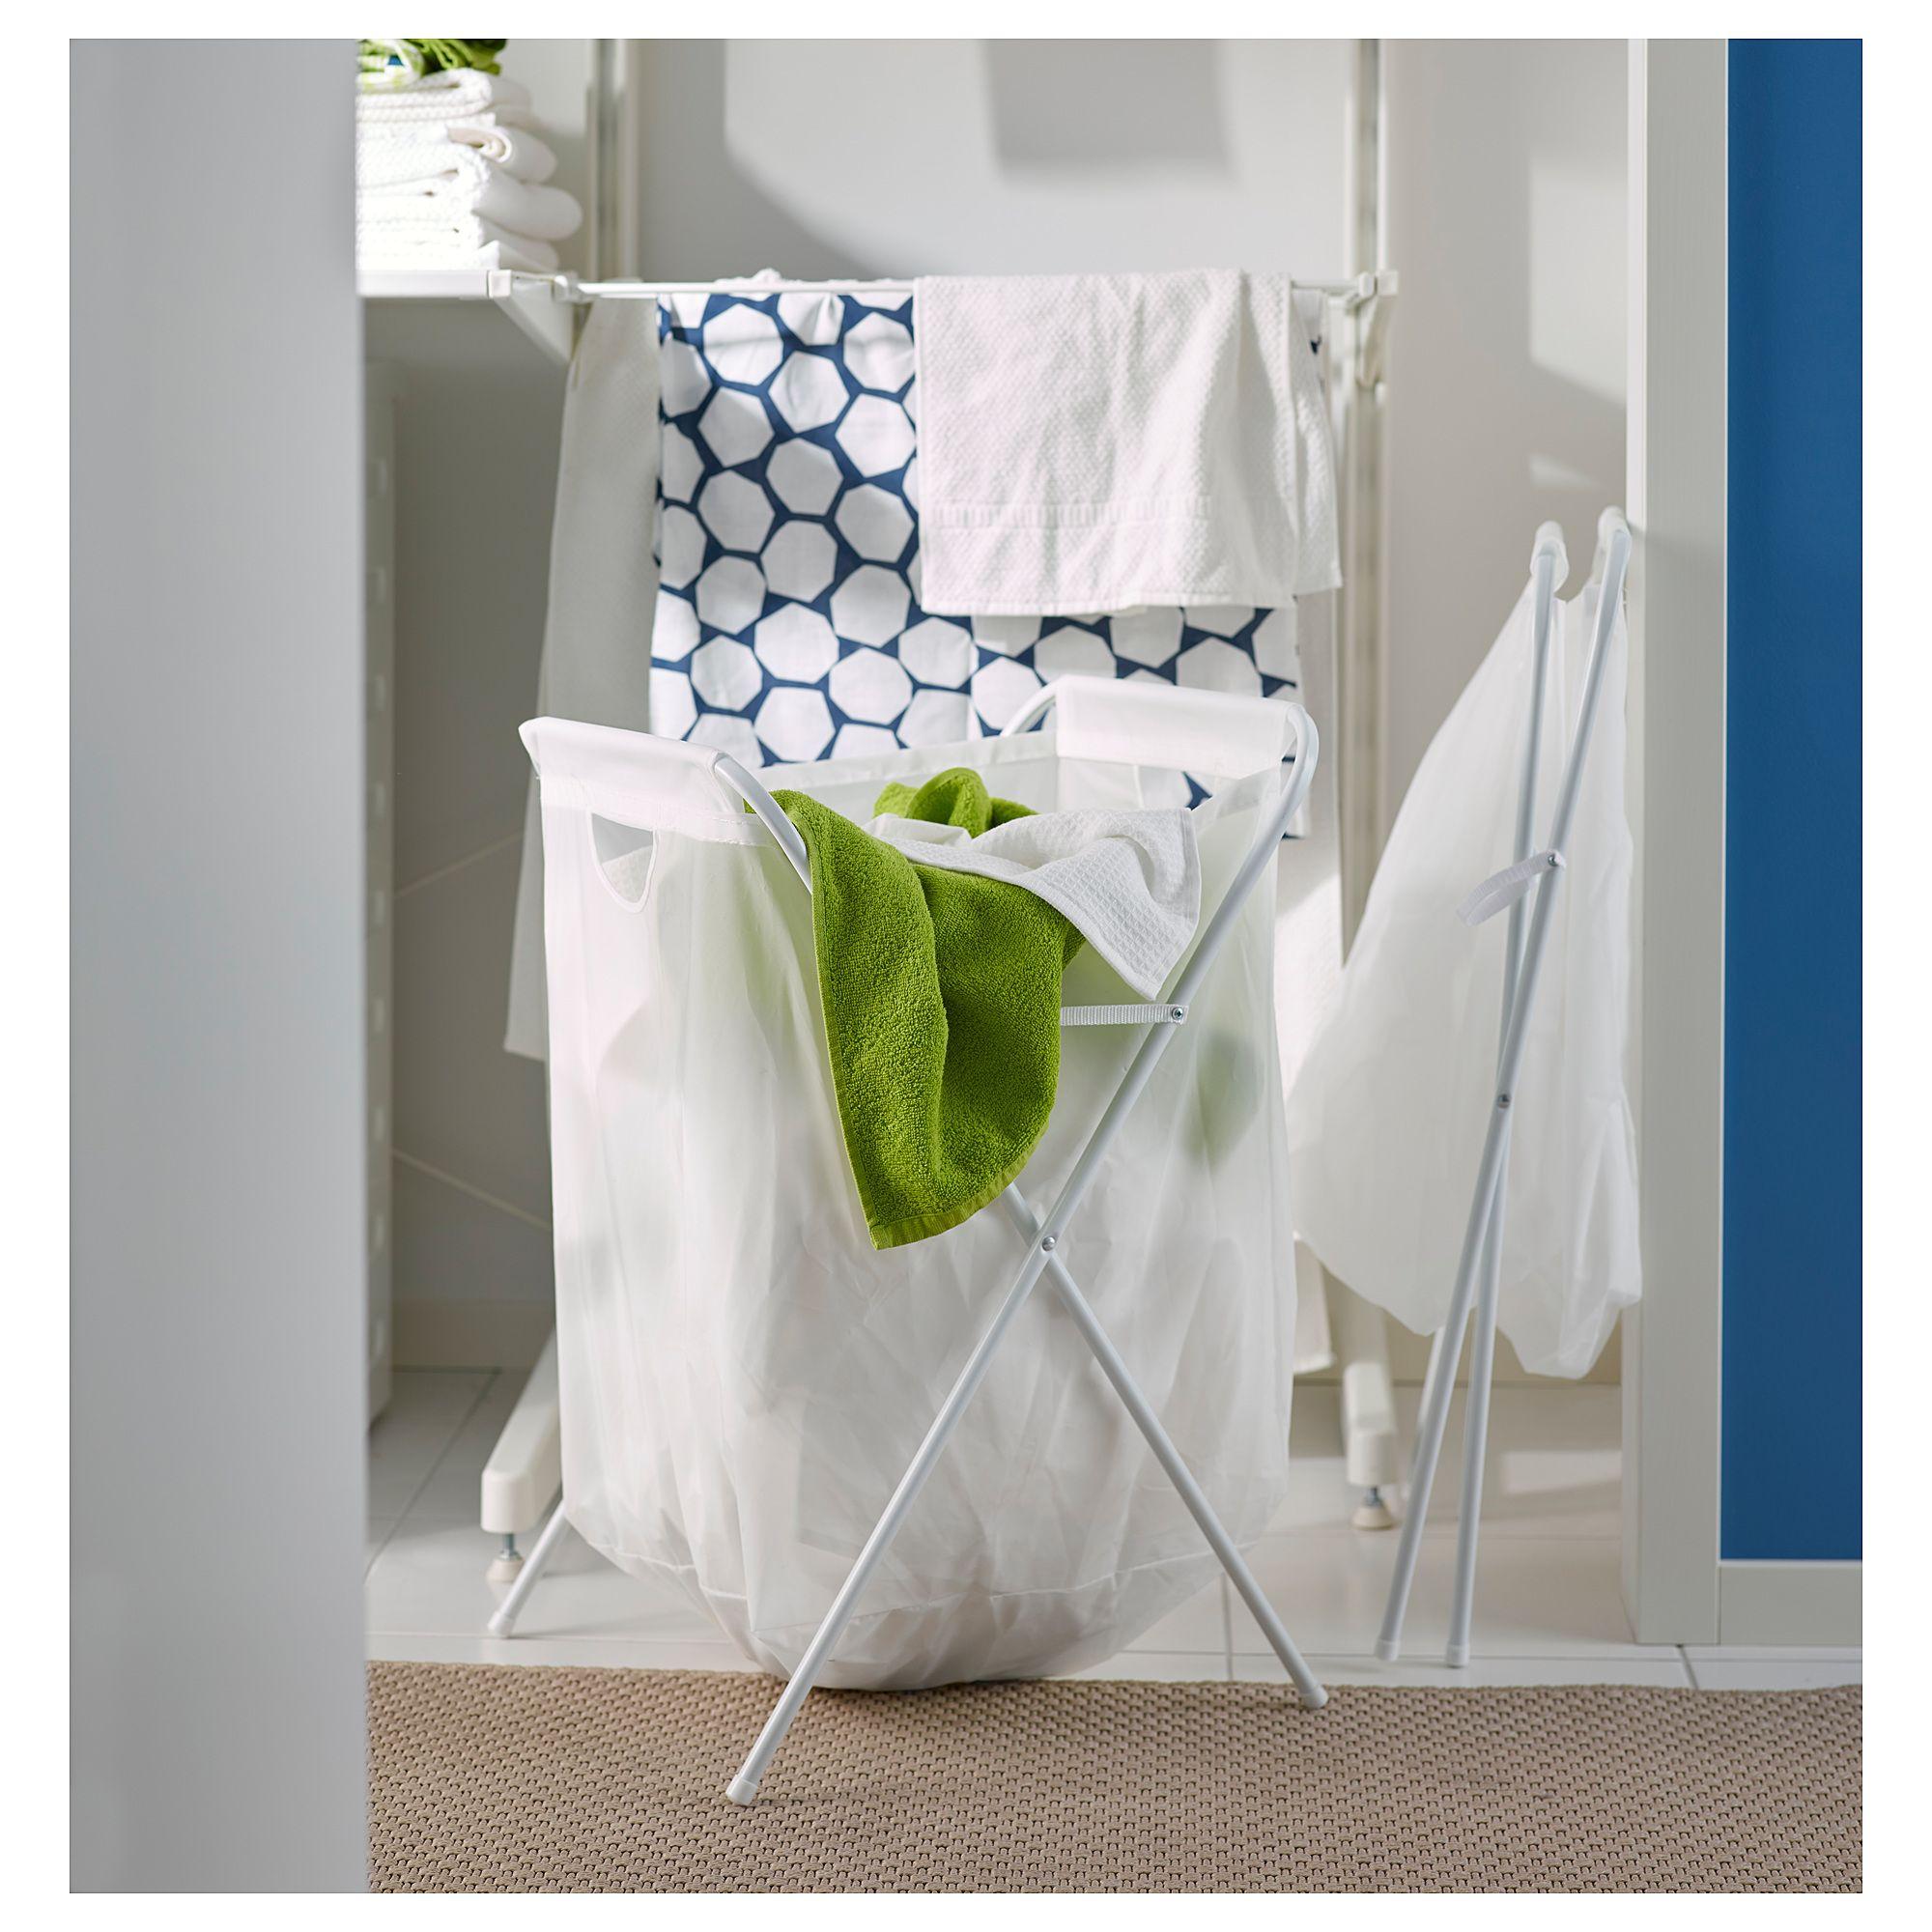 Ikea Jall Laundry Bag With Stand Ikea Laundry Ikea Shopping